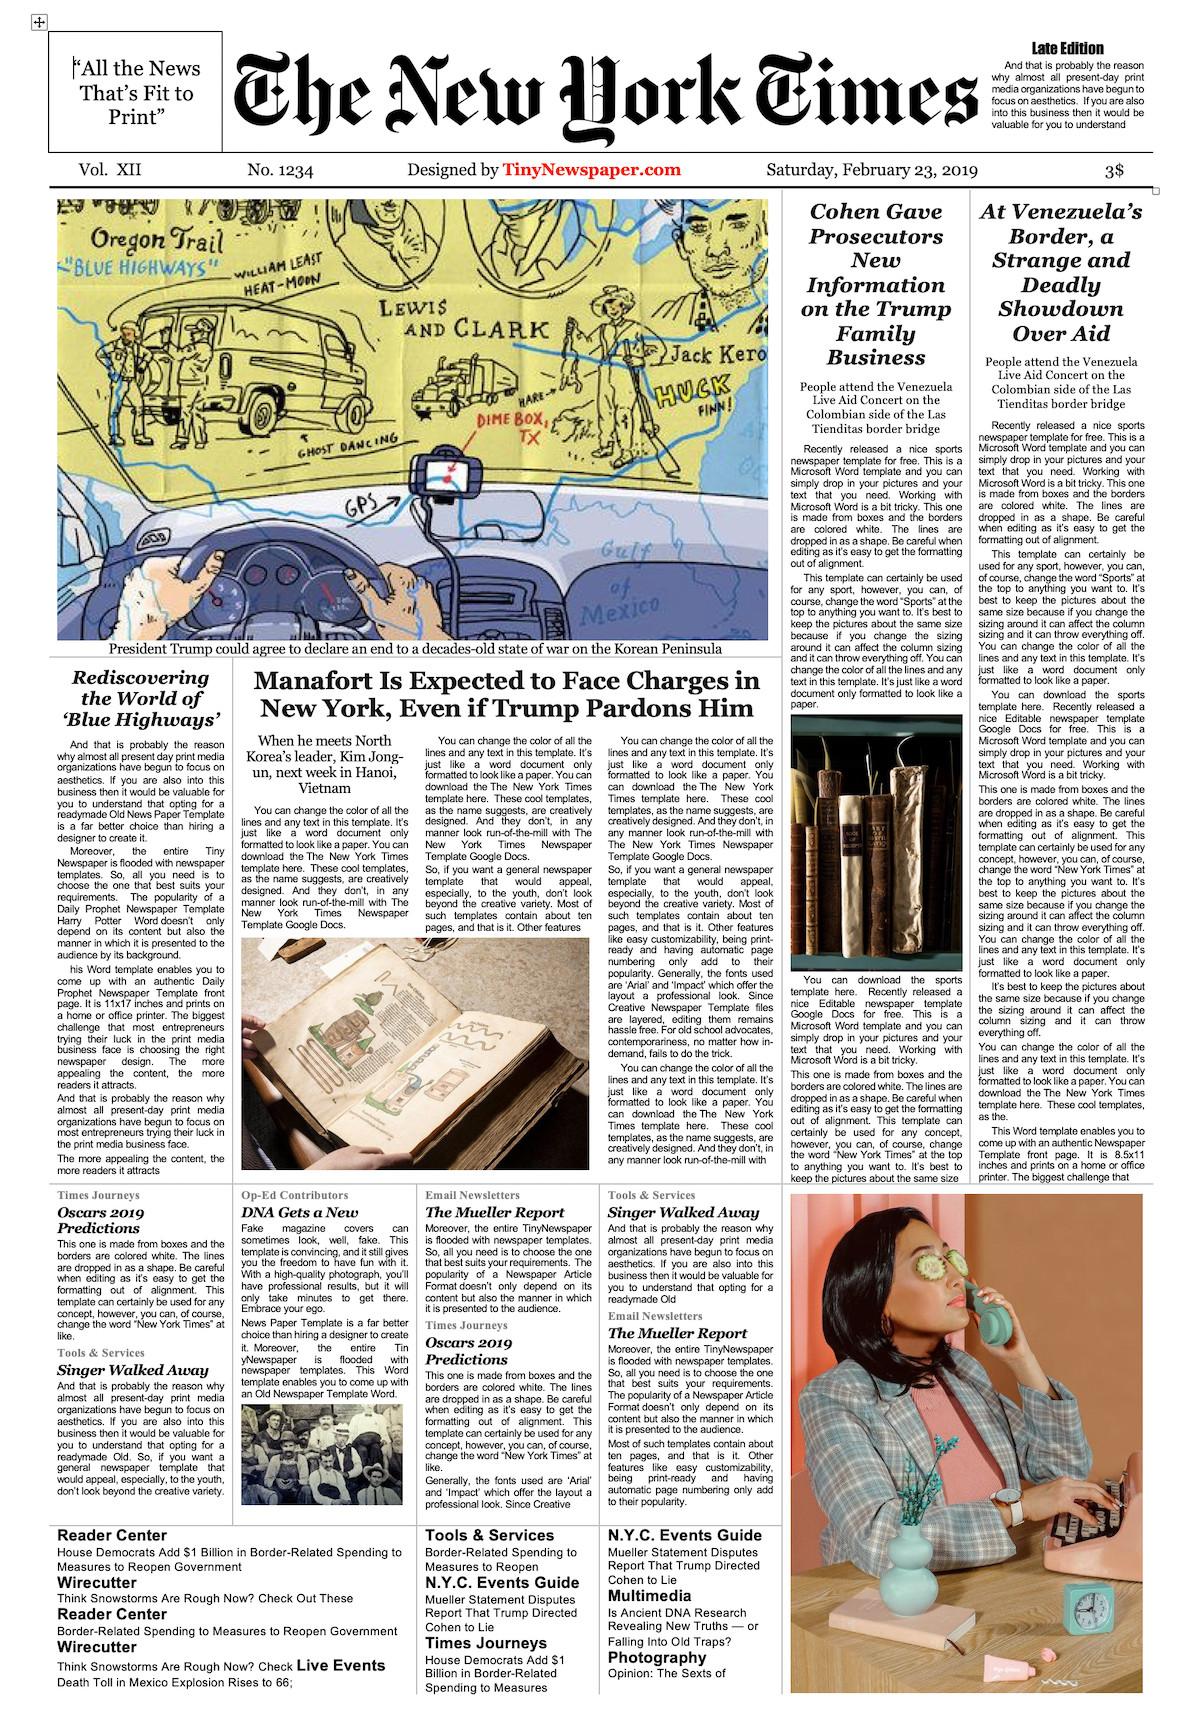 New York Times Newspaper Template Google Docs Newspaper Template Google Docs